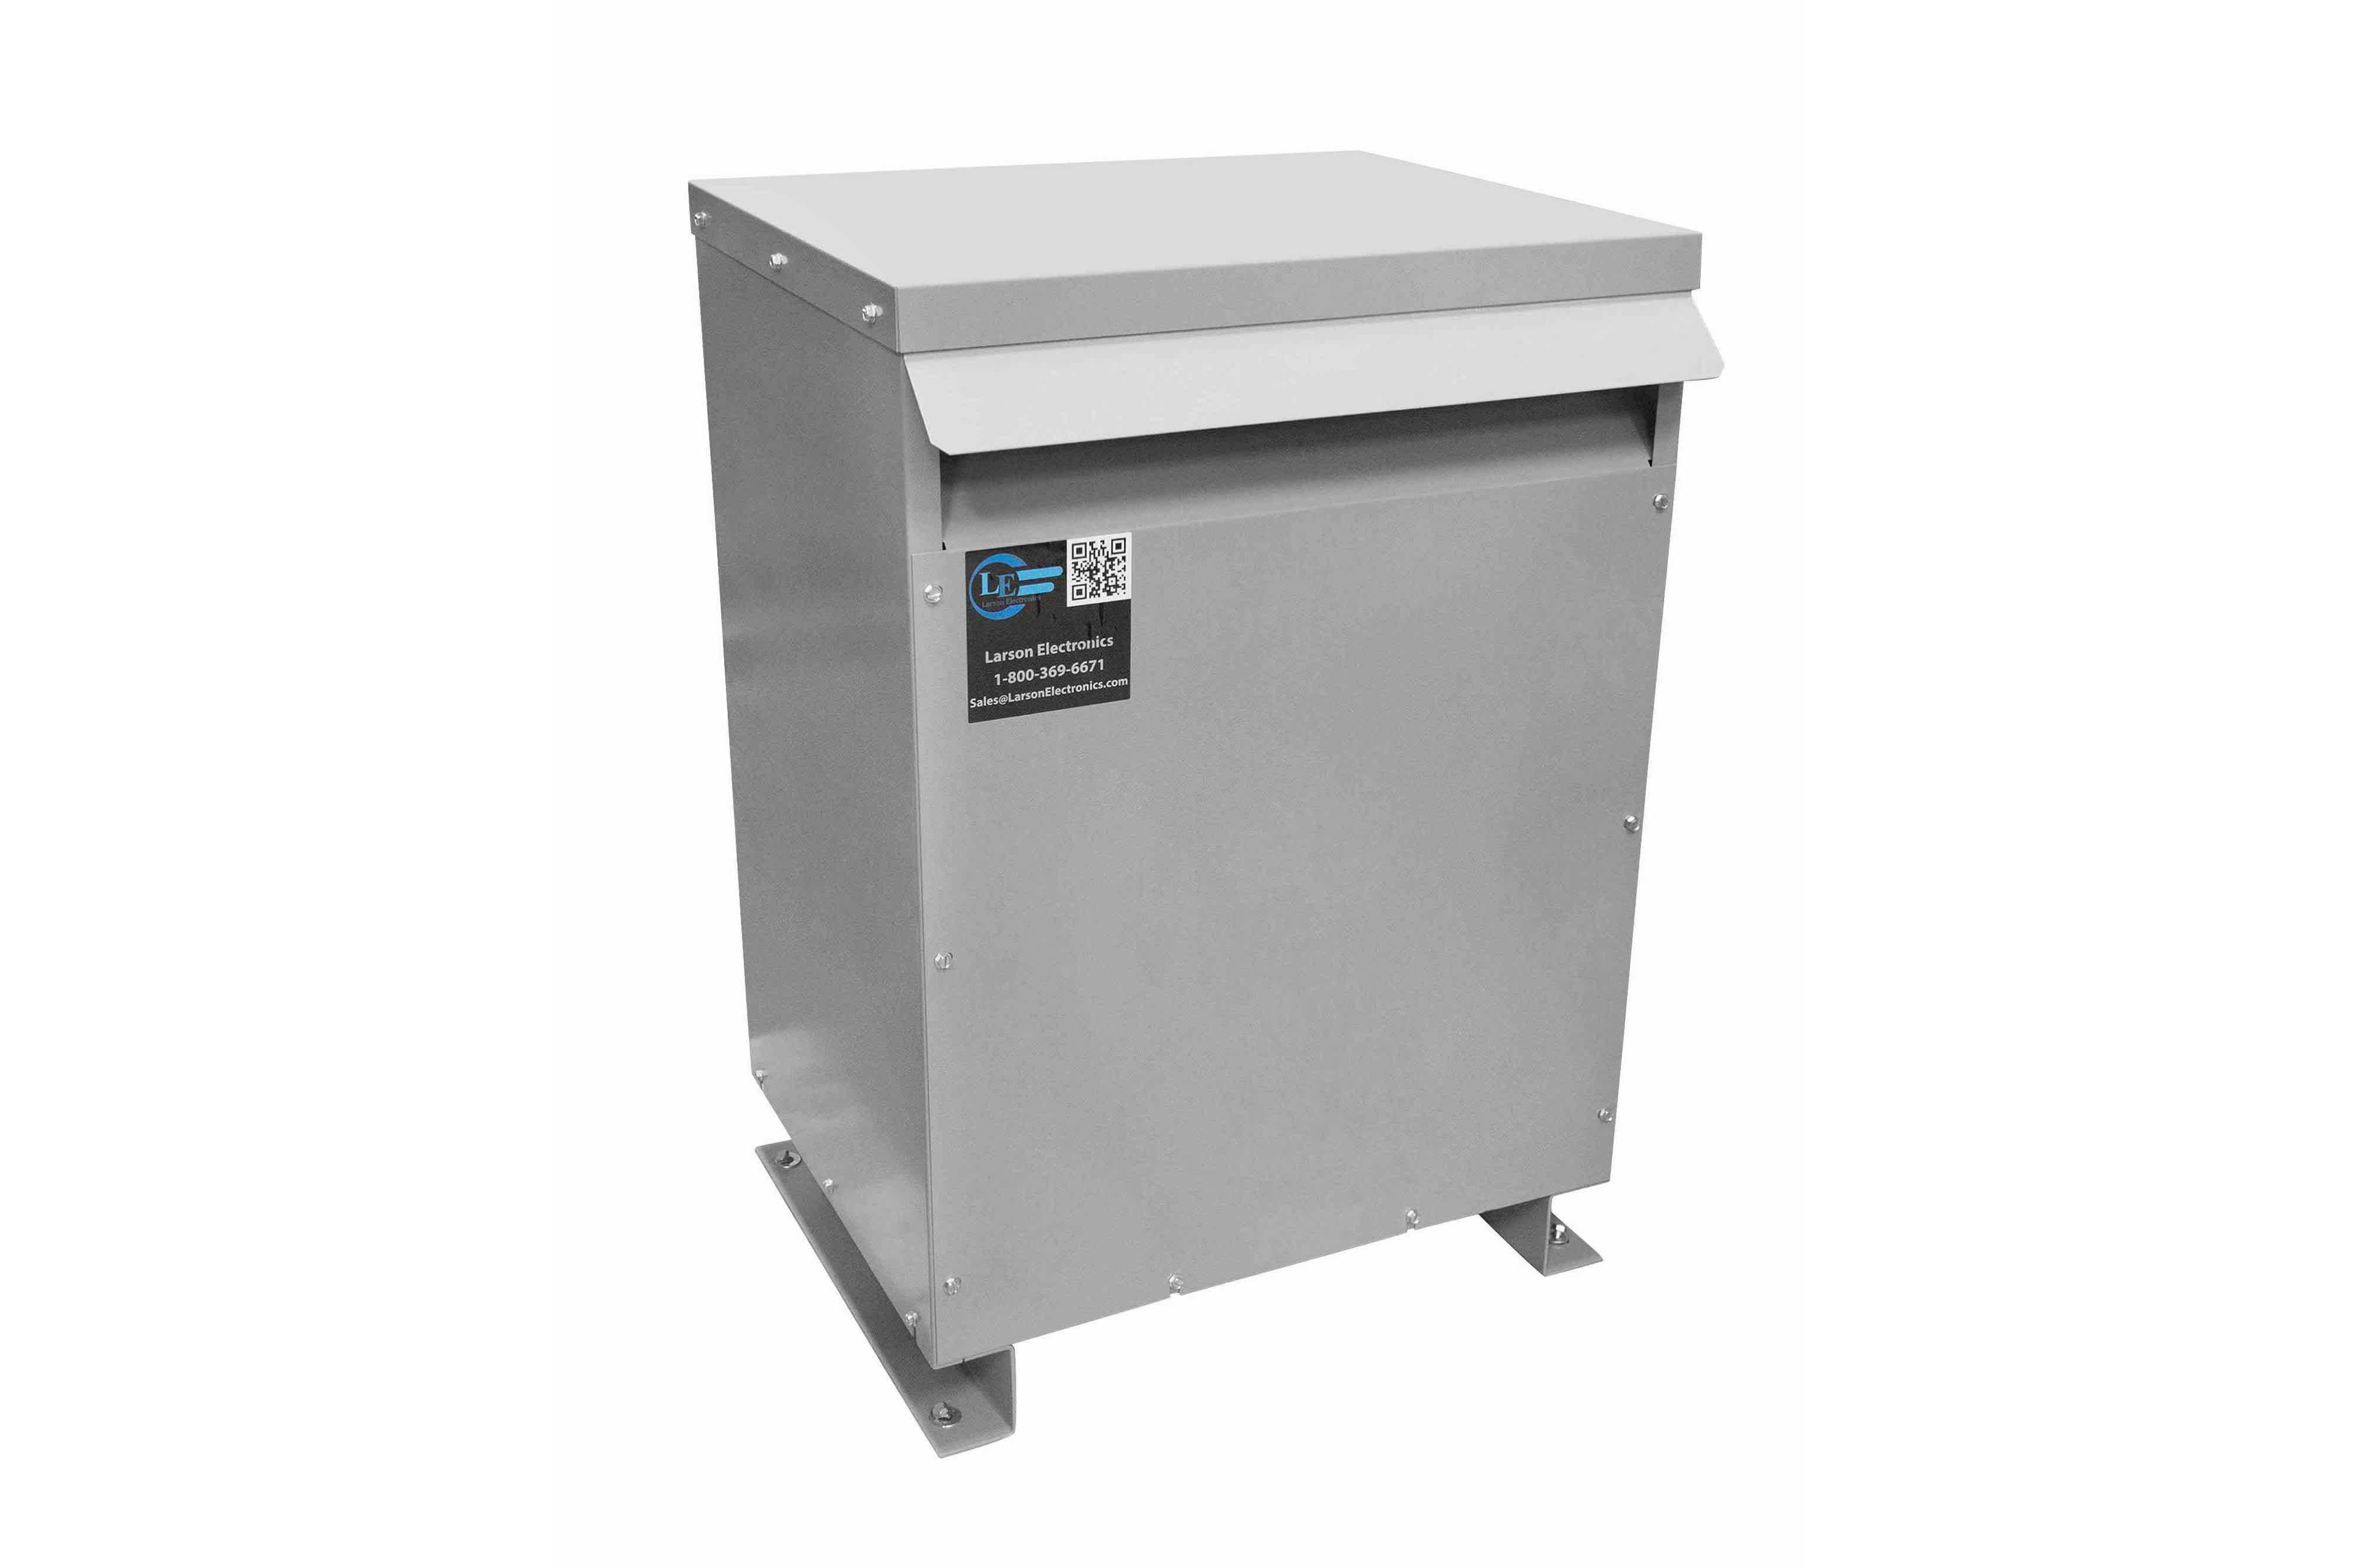 22.5 kVA 3PH Isolation Transformer, 600V Wye Primary, 400V Delta Secondary, N3R, Ventilated, 60 Hz